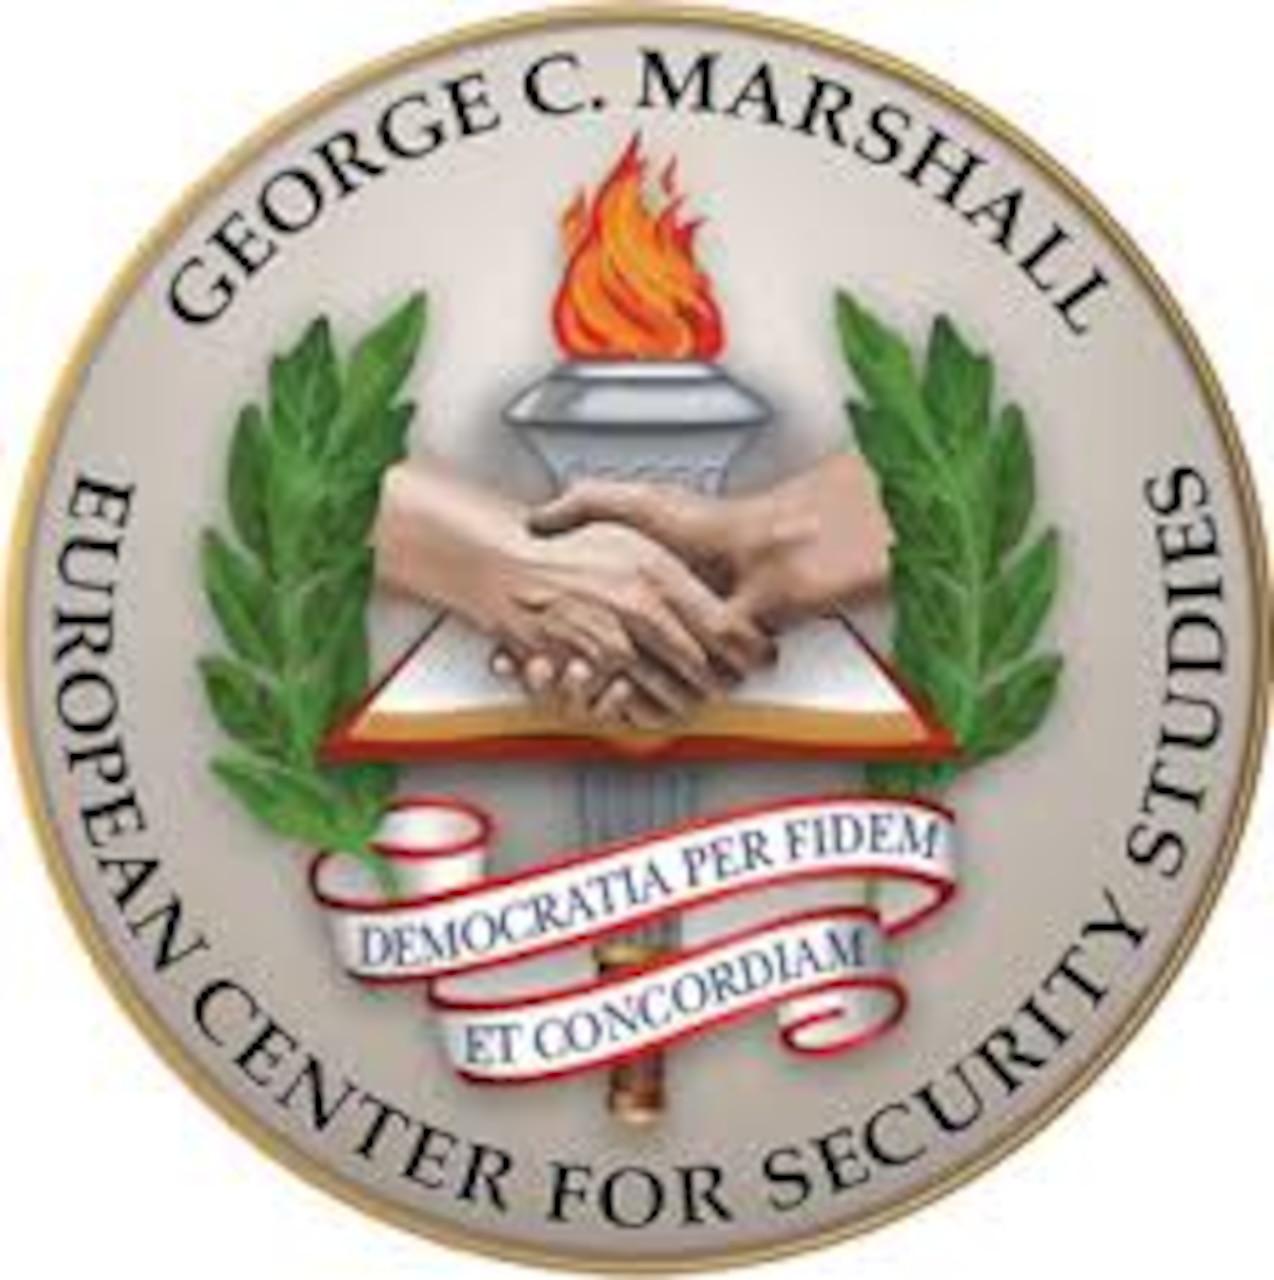 Marshall Center Seal. DoD graphic